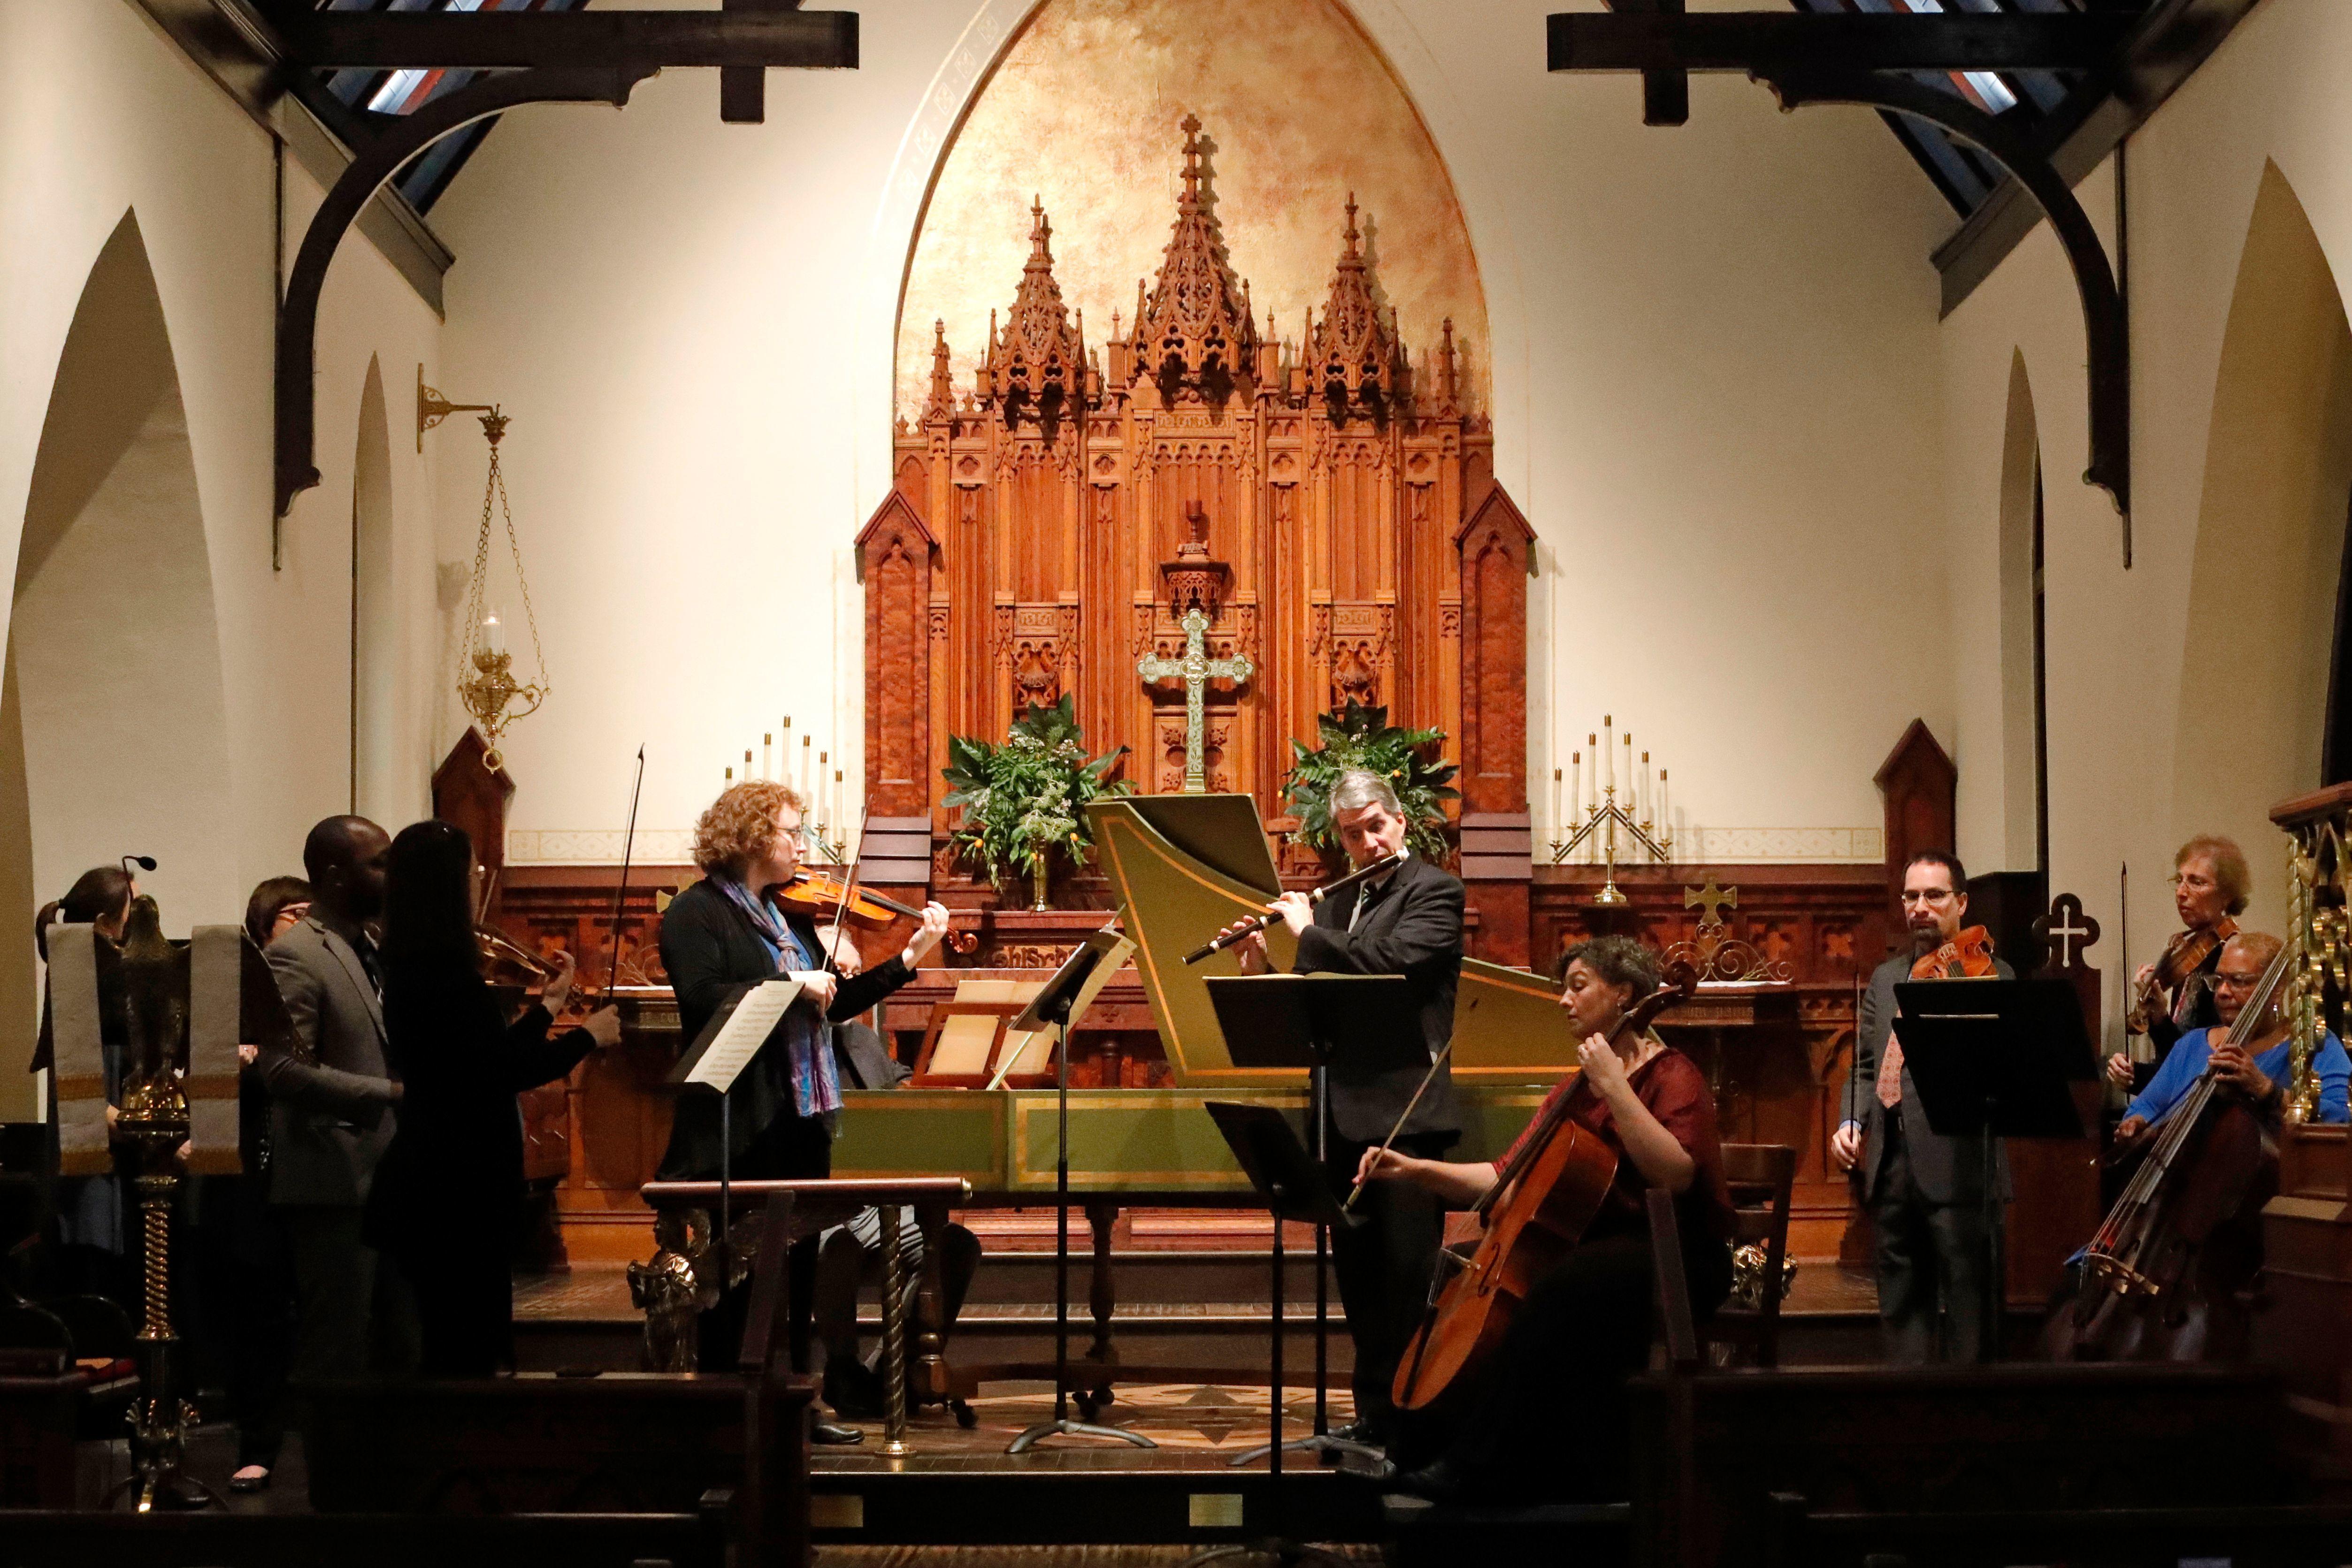 The Tallahassee Bach Parley kicks off its 38th concert season Sunday.